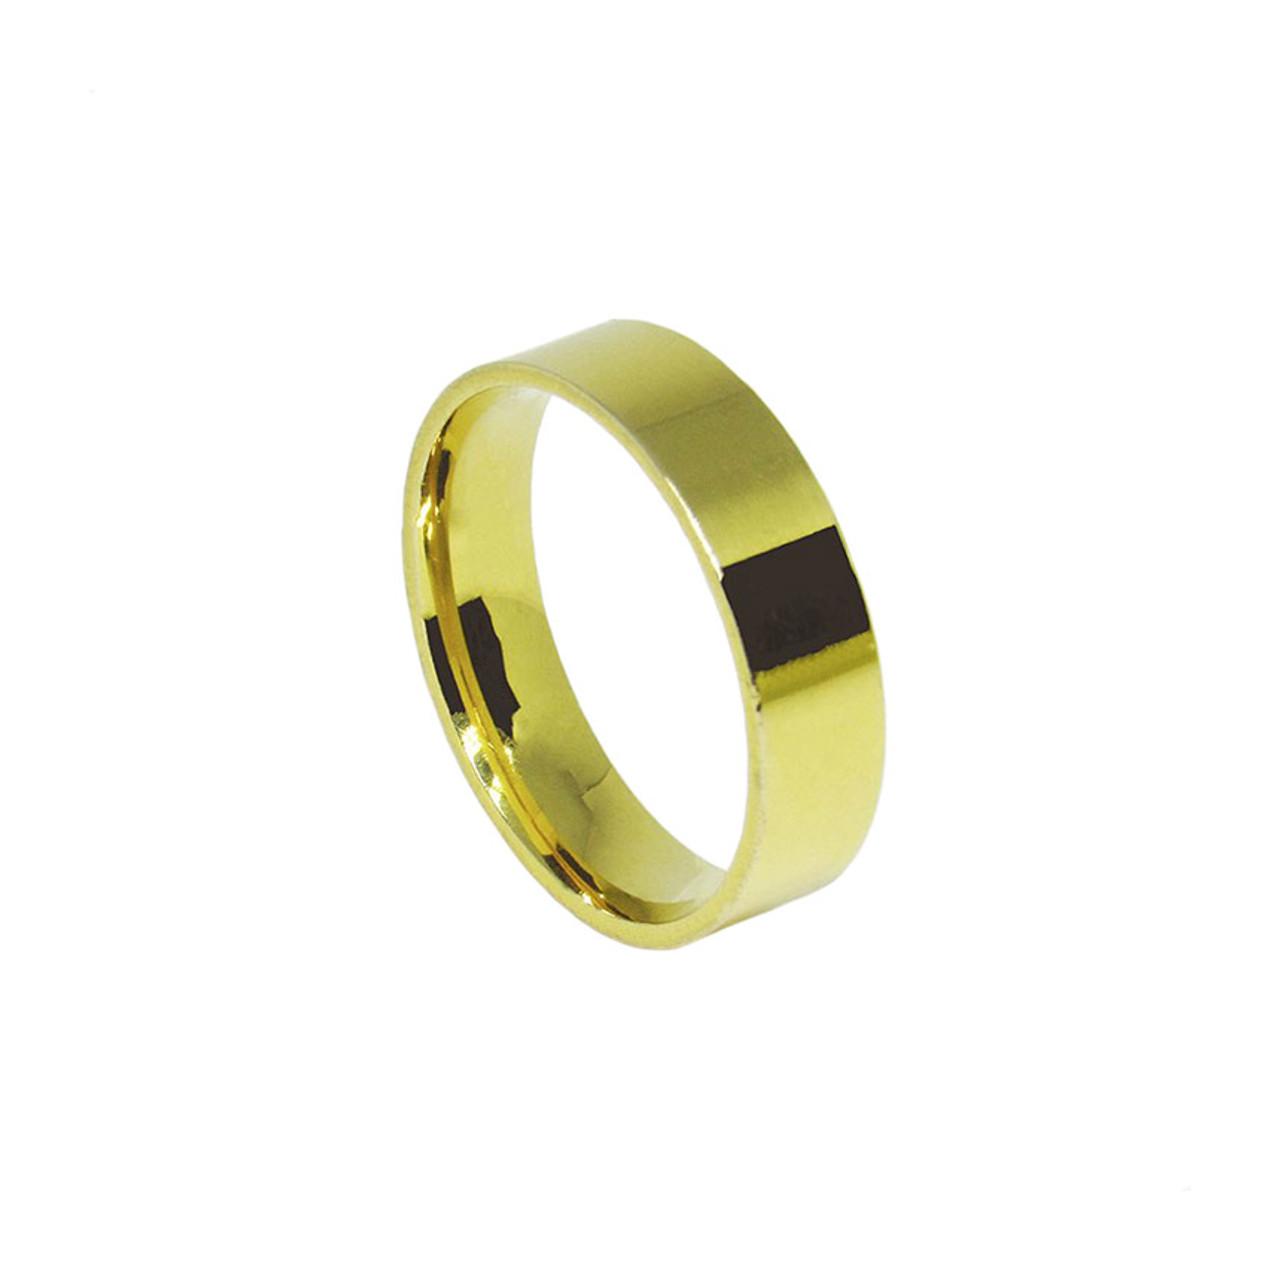 e27c4ce936c9c Aliança de ouro 18k Anatômica Maciça Lateral Reta 5mm (CJAL-00000610)